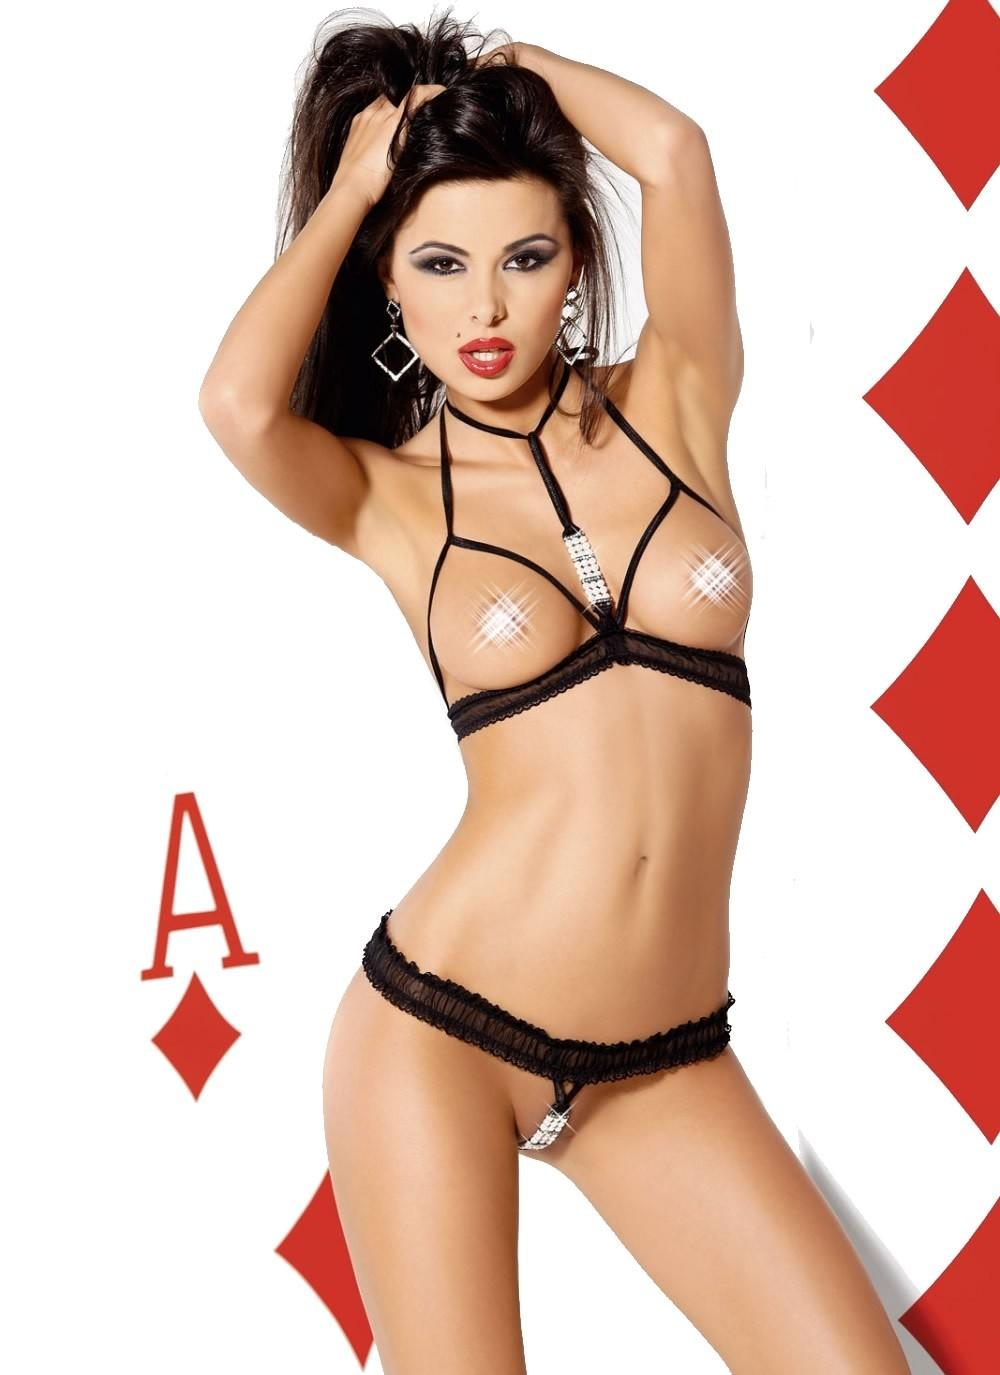 Hidden Ace Open Cup Bra & Panty